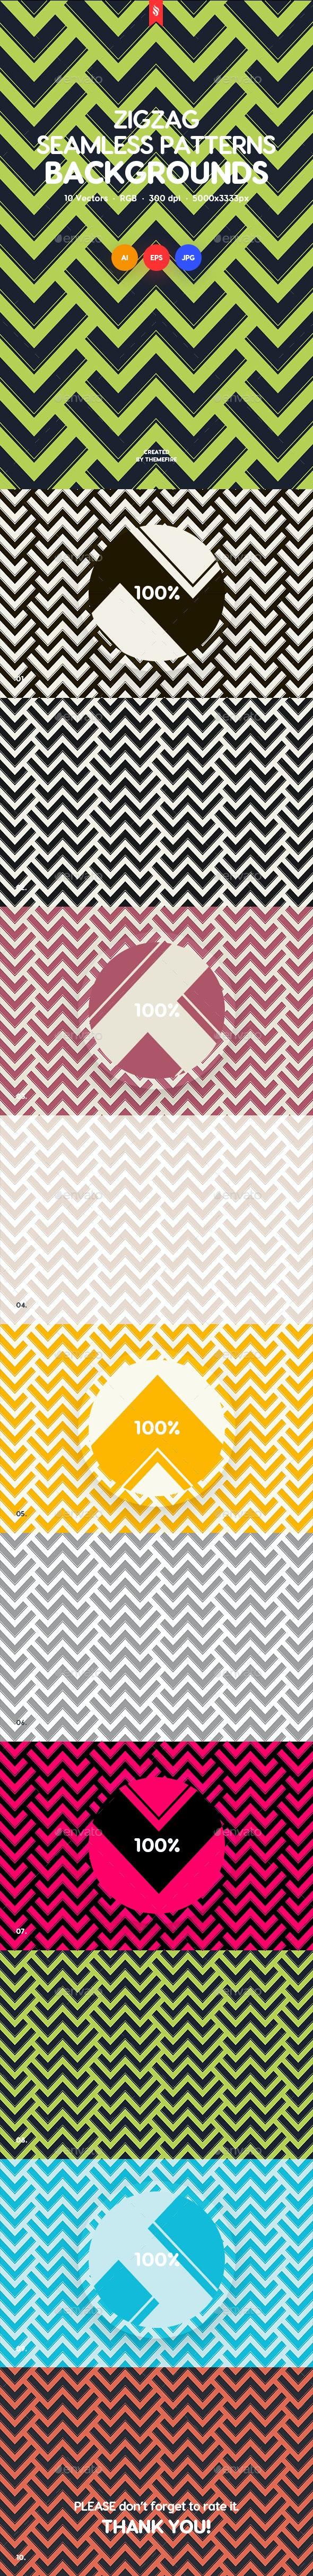 ZigZag Seamless Patterns / Backgrounds - Patterns Backgrounds